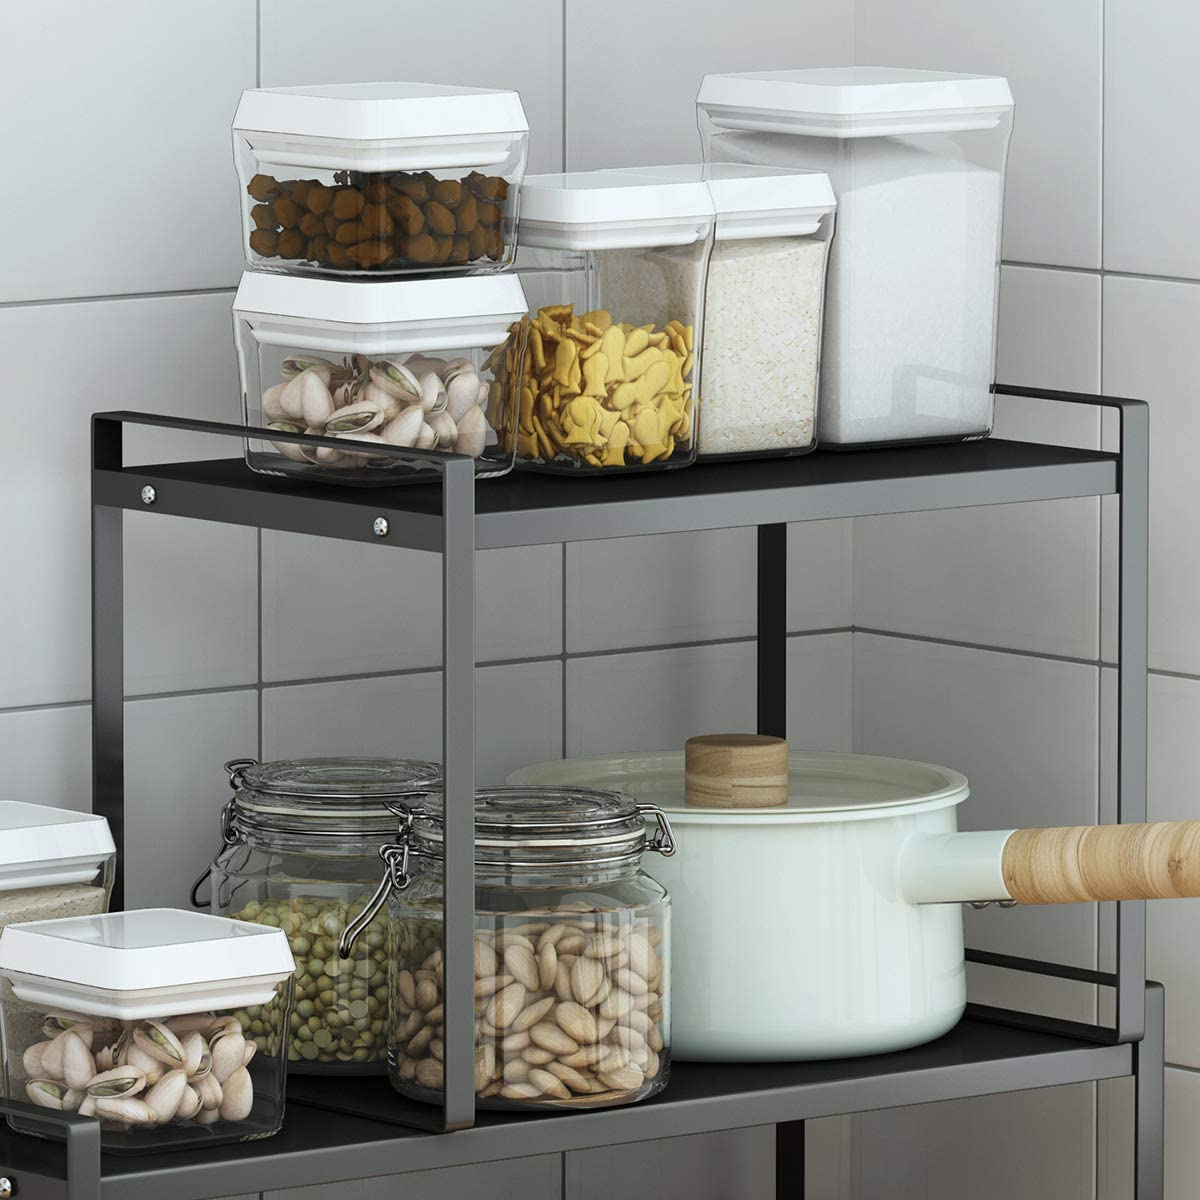 Countertop Organizer, Cupboard Stand Spice Rack, 13